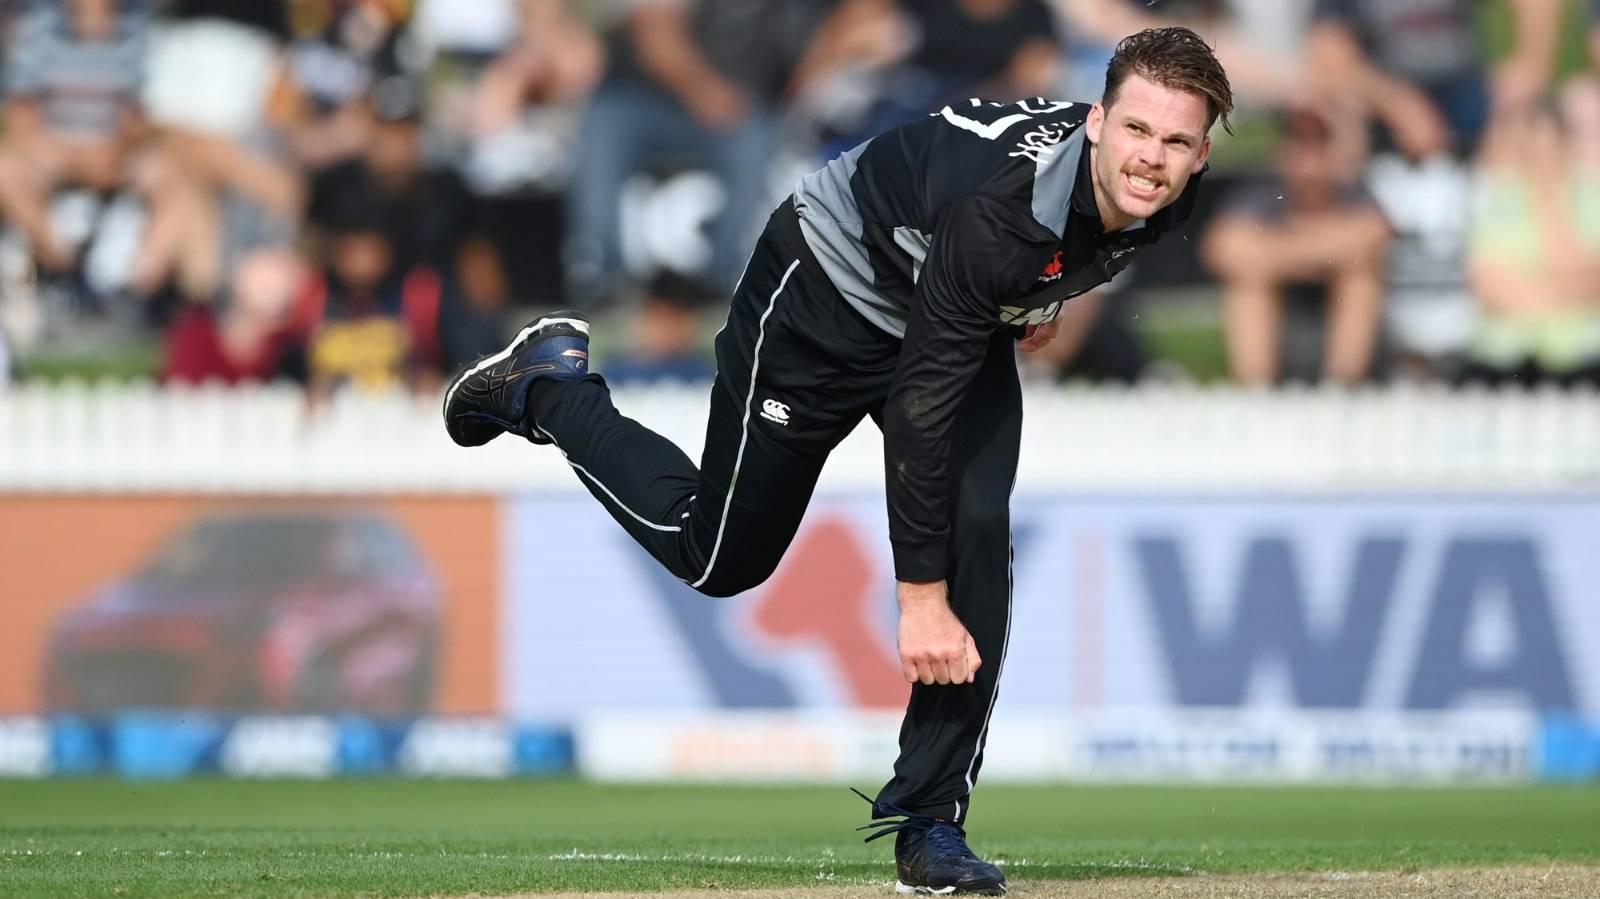 Lockie Ferguson out of Twenty20 World Cup with injury